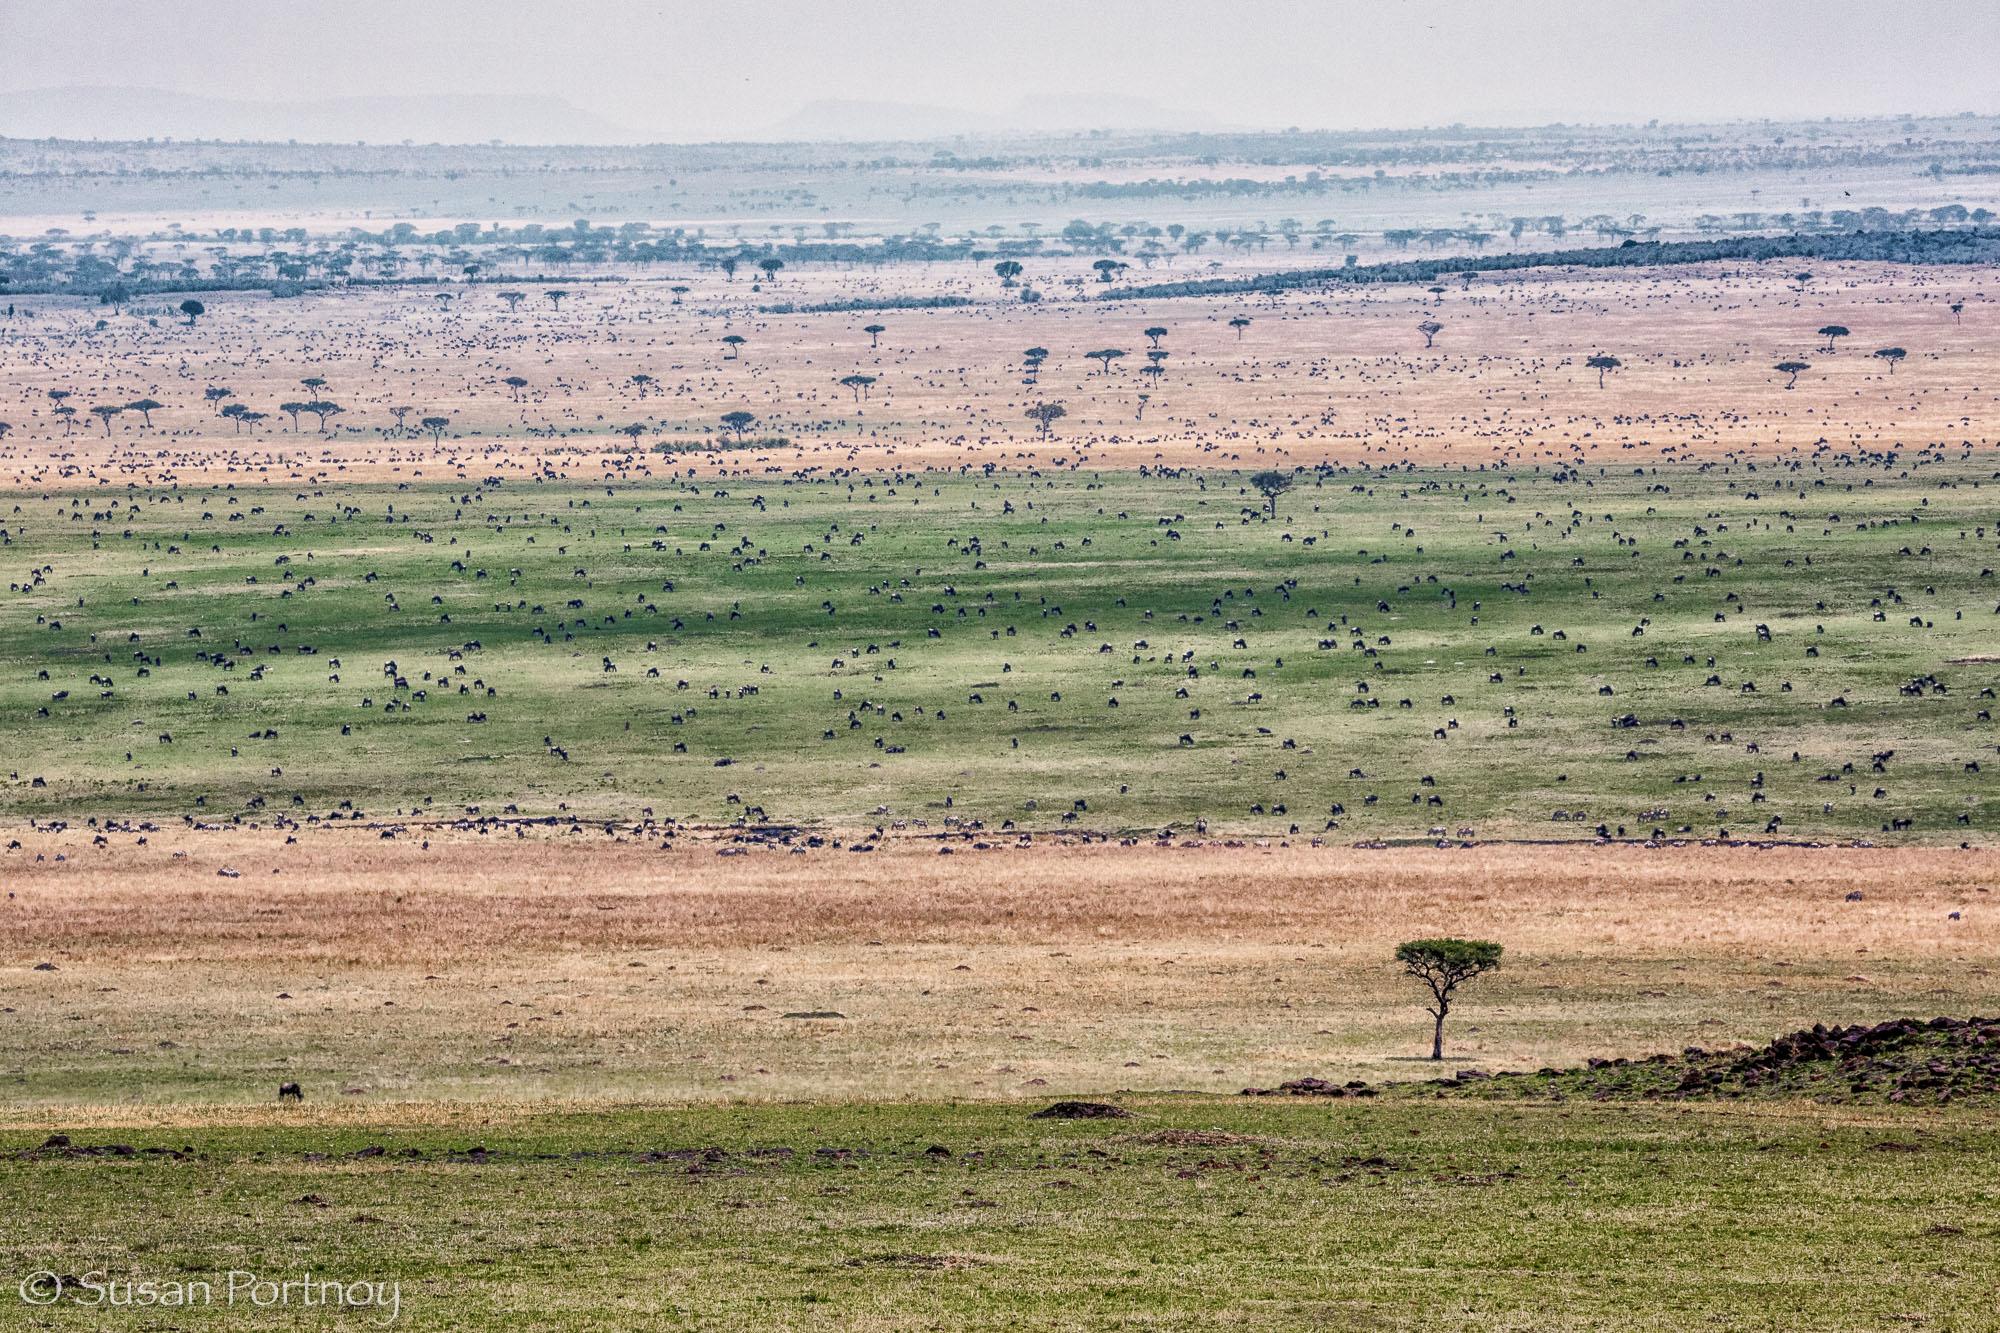 Landscape photos celebrating Earth Day_SusanPortnoy-17